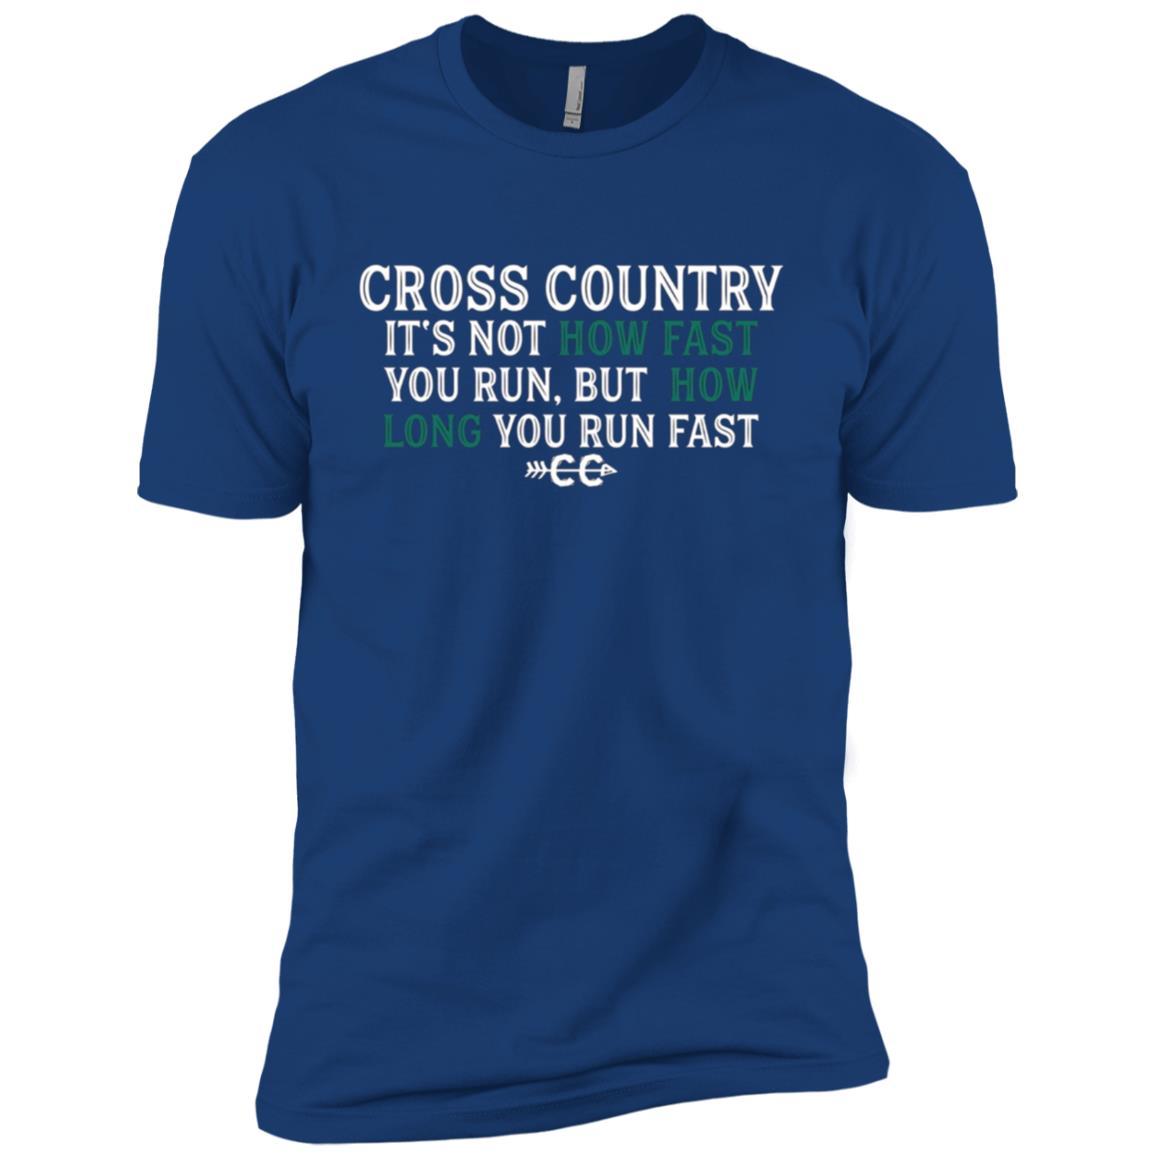 Cross Country Runnings – Funny Cross Country Running Men Short Sleeve T-Shirt